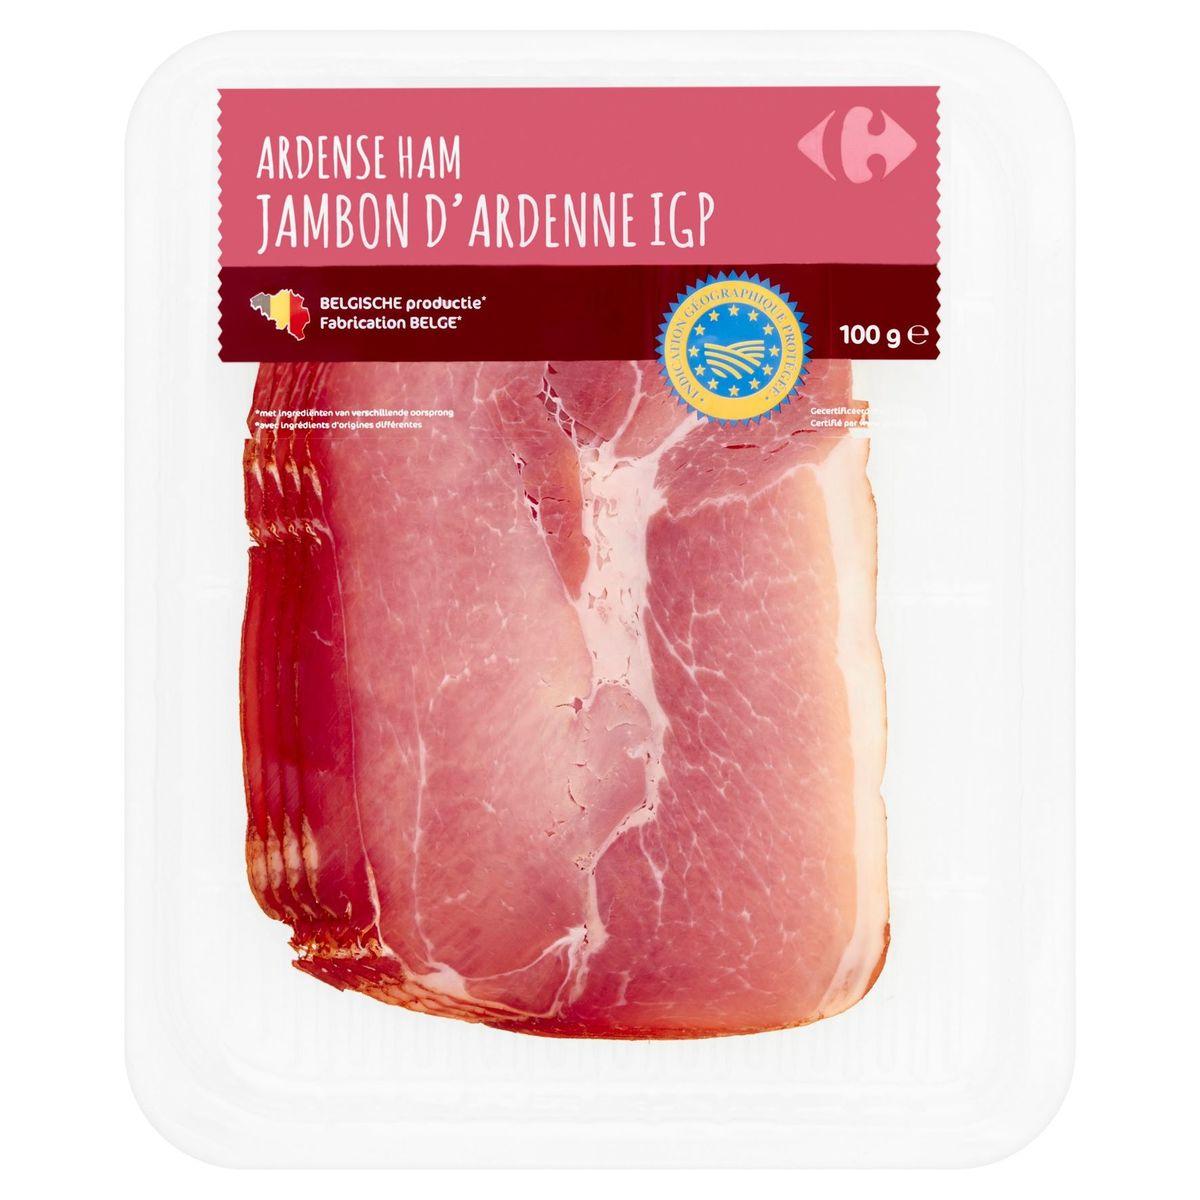 Carrefour Ardense Ham 100 g